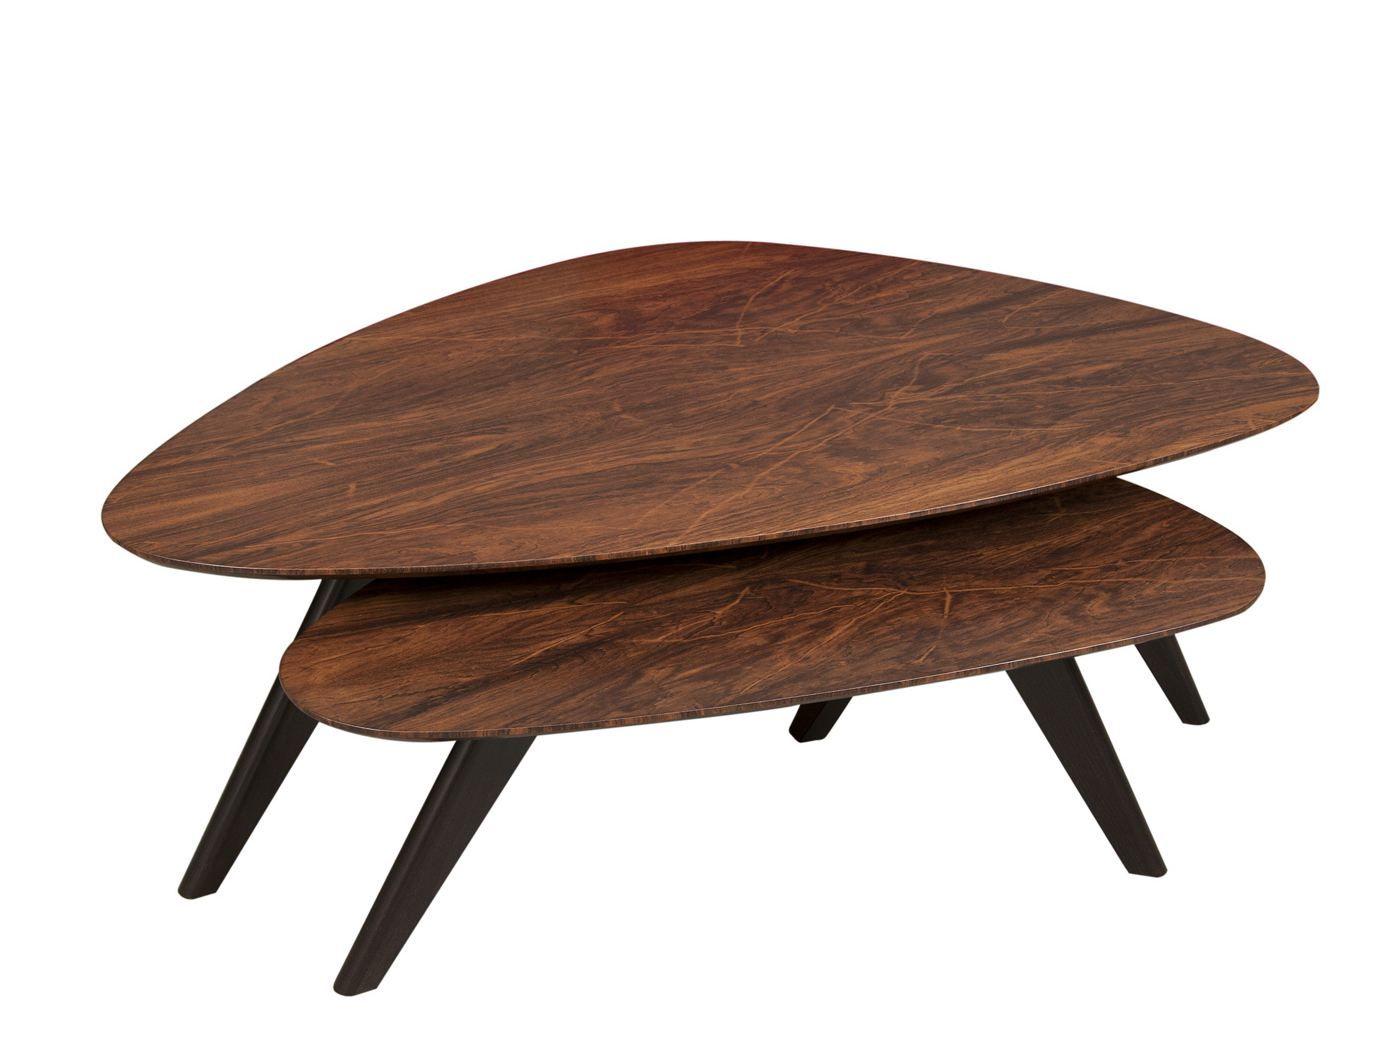 Triangular Wooden Coffee Table Jasper By Hamilton Conte Paris Design Fabian  Pellegrinet Conte